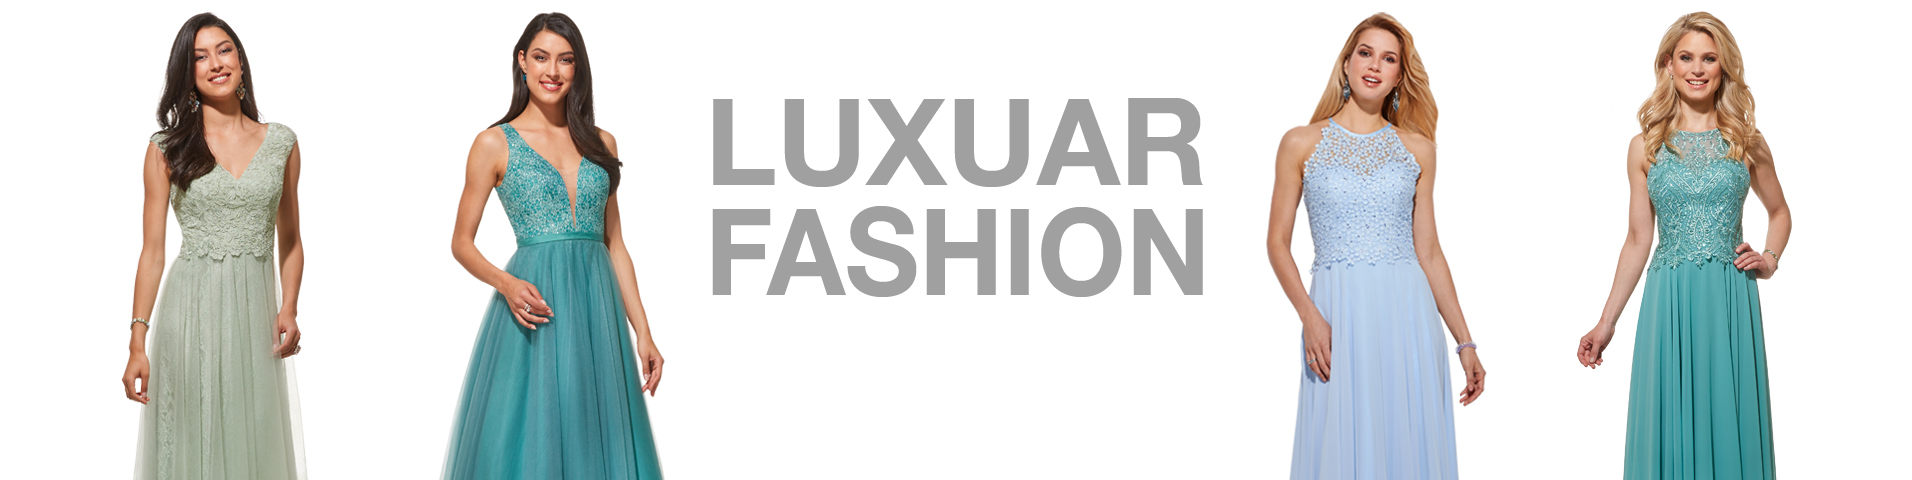 54ce8306b503 Luxuar Fashion Online Shop   Luxuar Fashion online bestellen bei Zalando